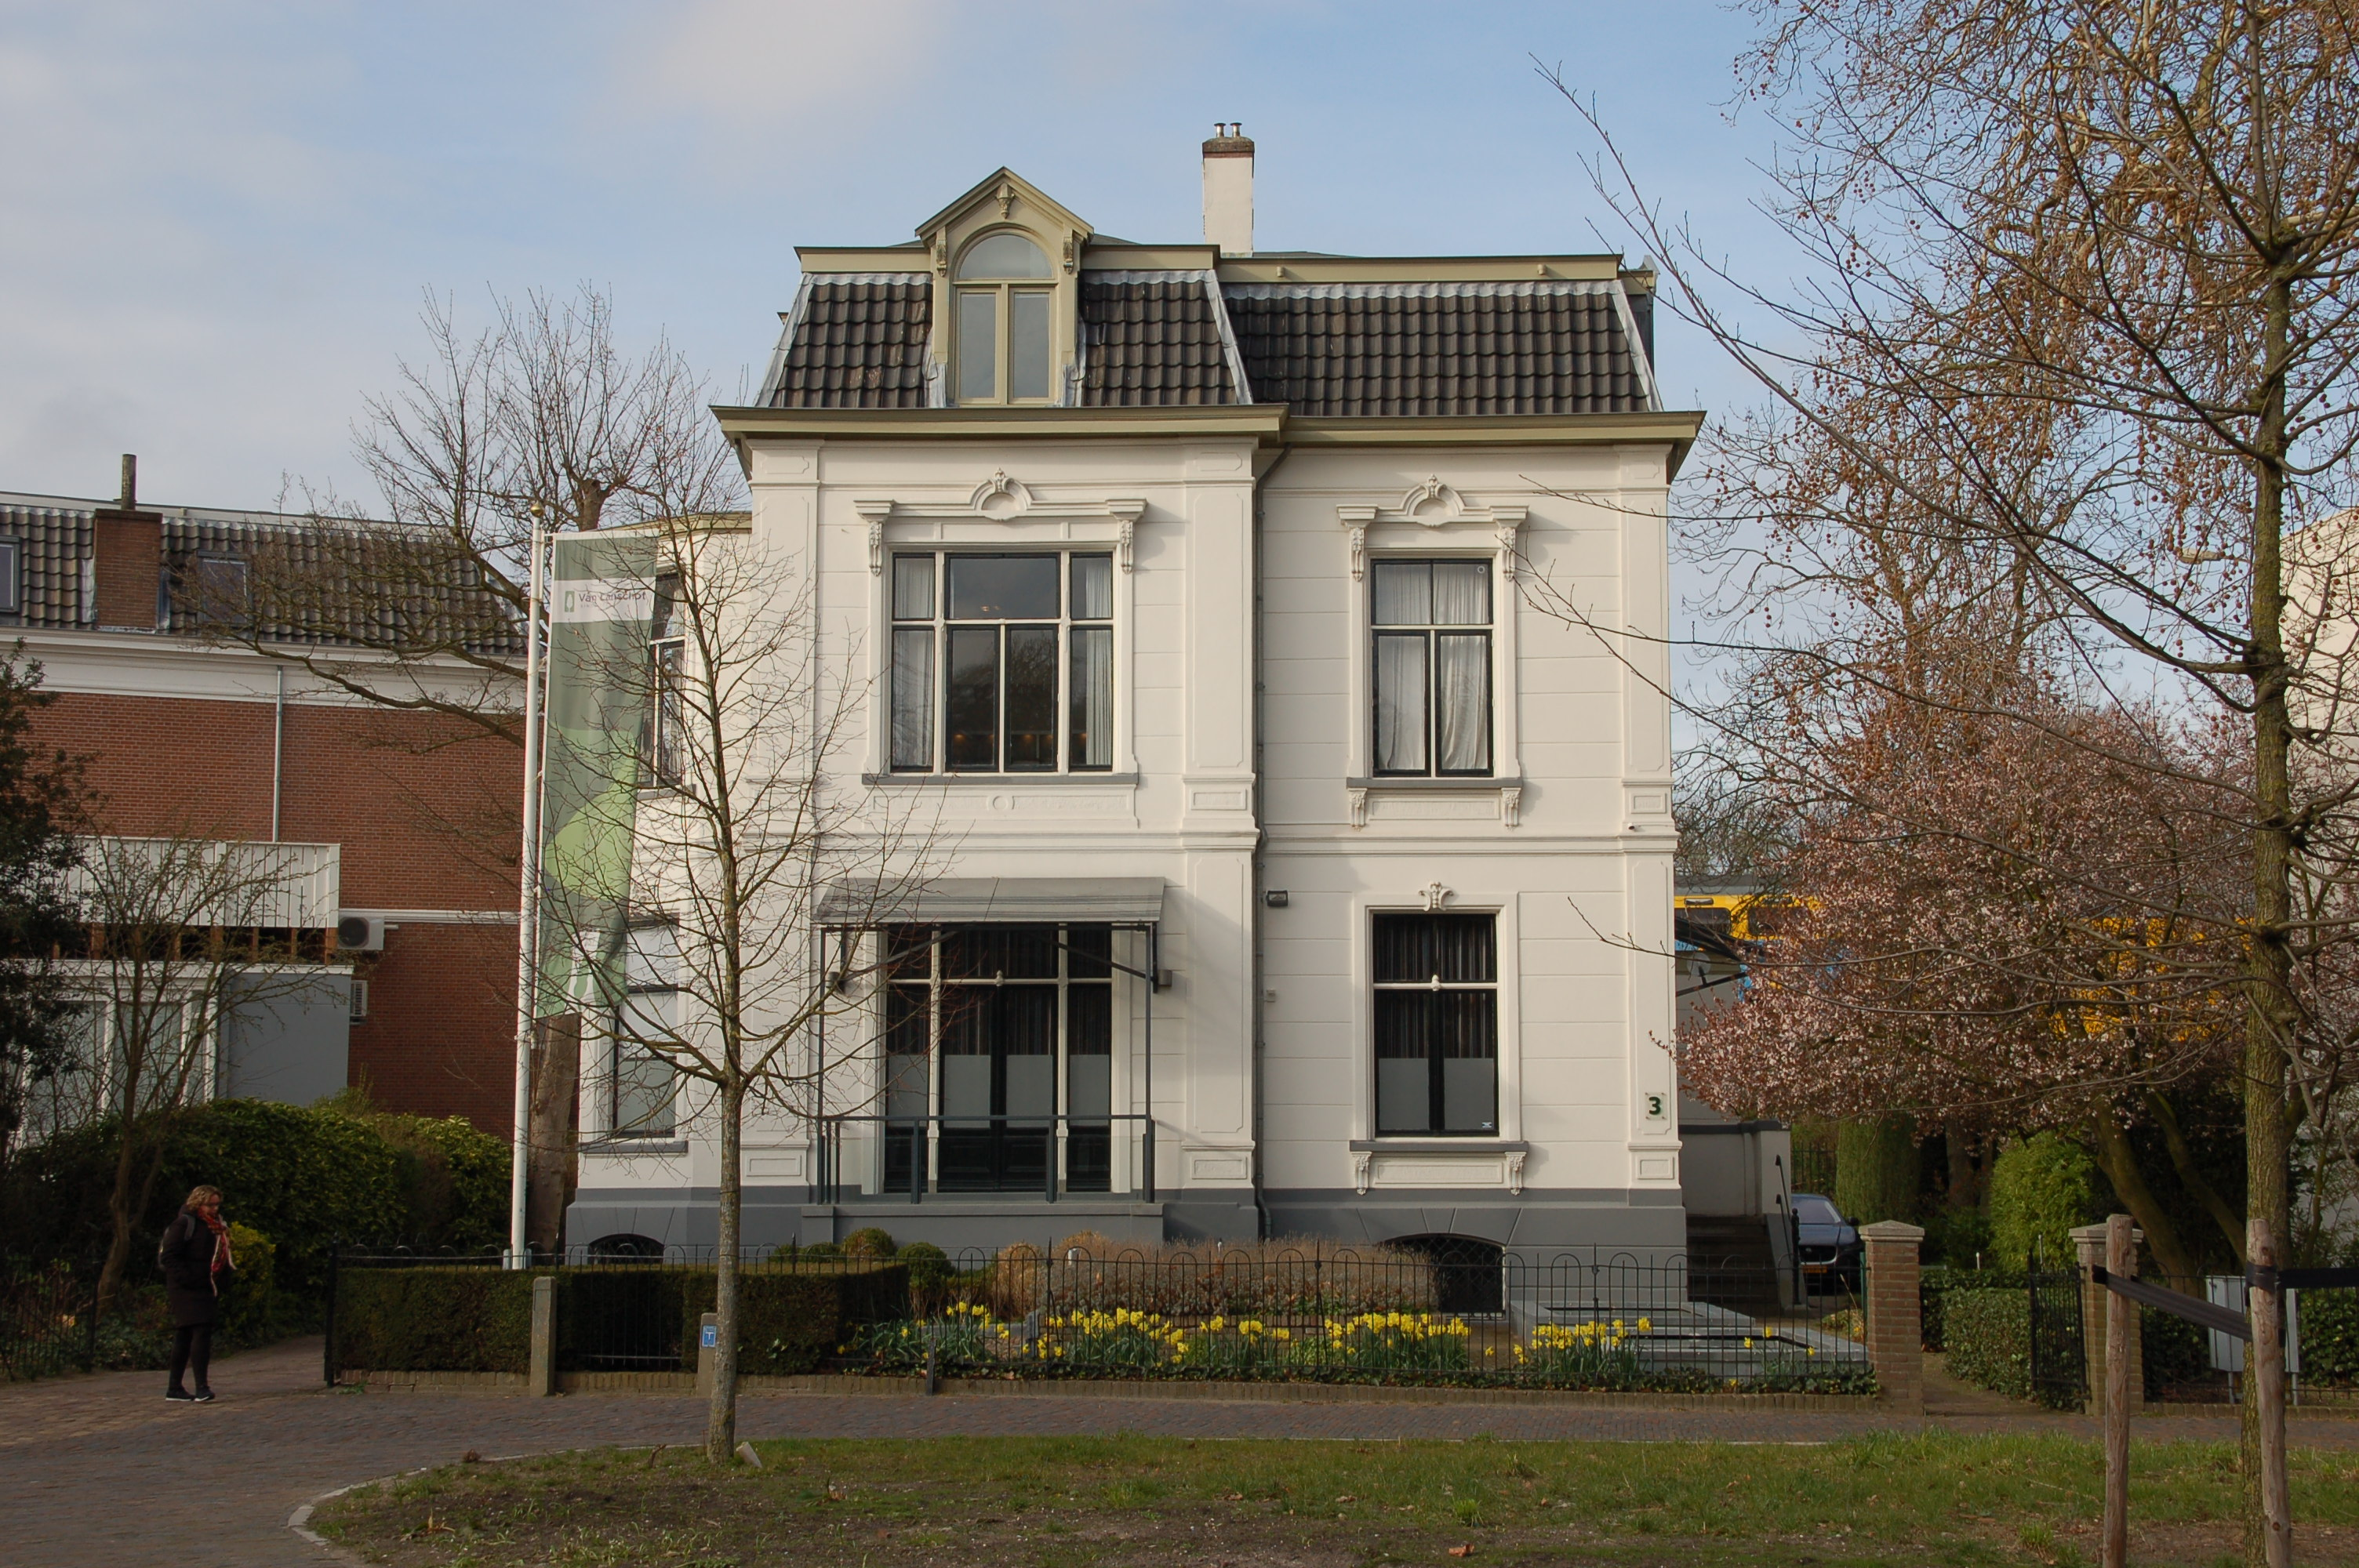 Kenaupark 3 Haarlem